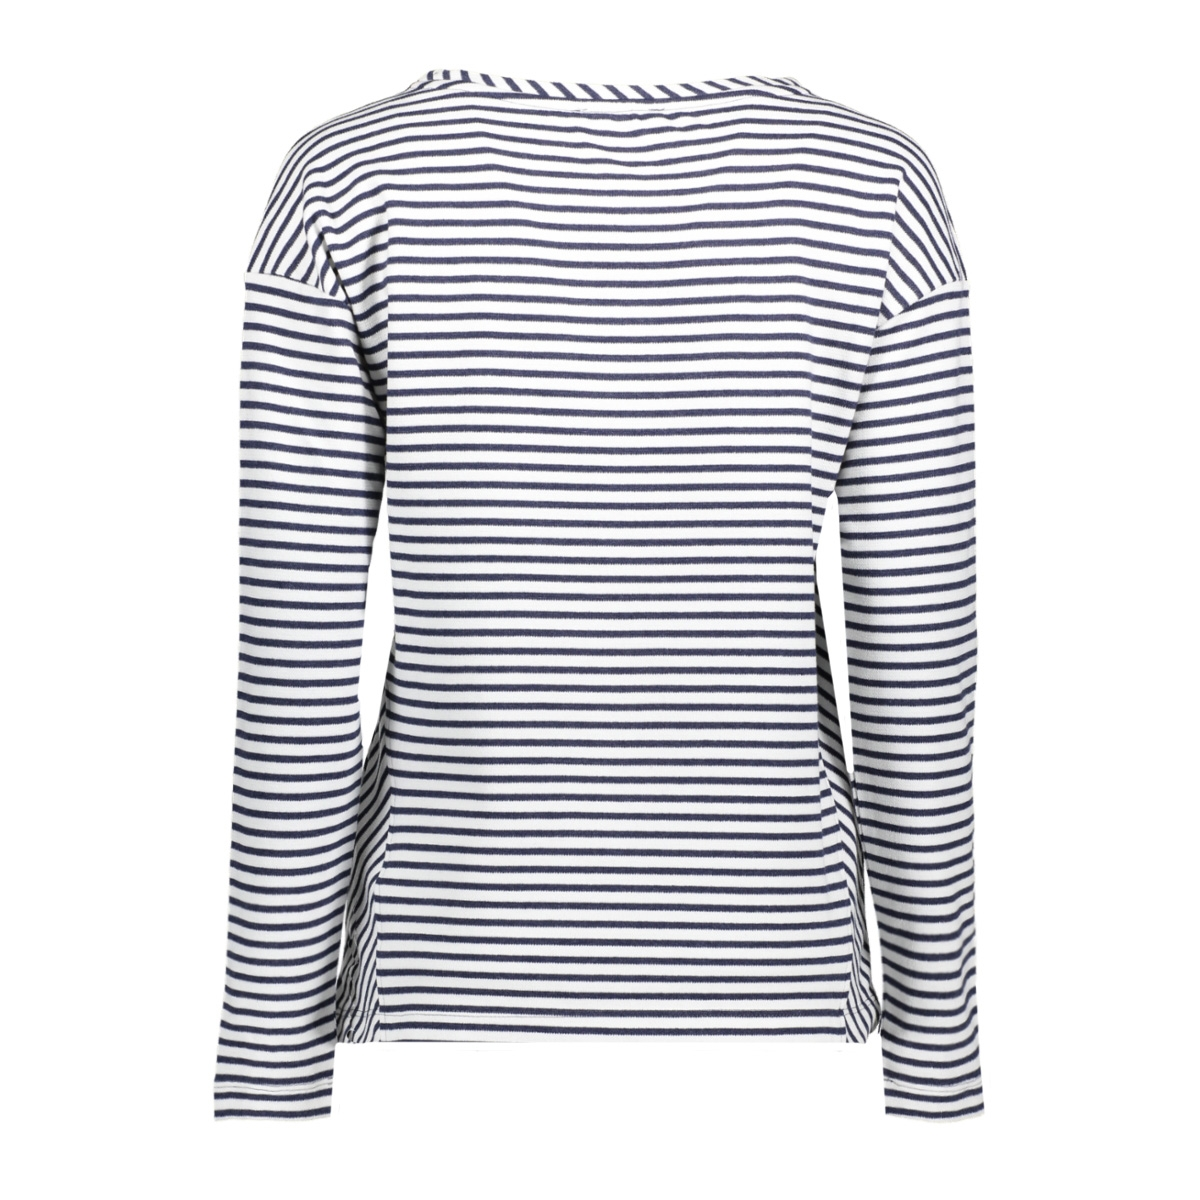 127cc1j017 edc sweater c400